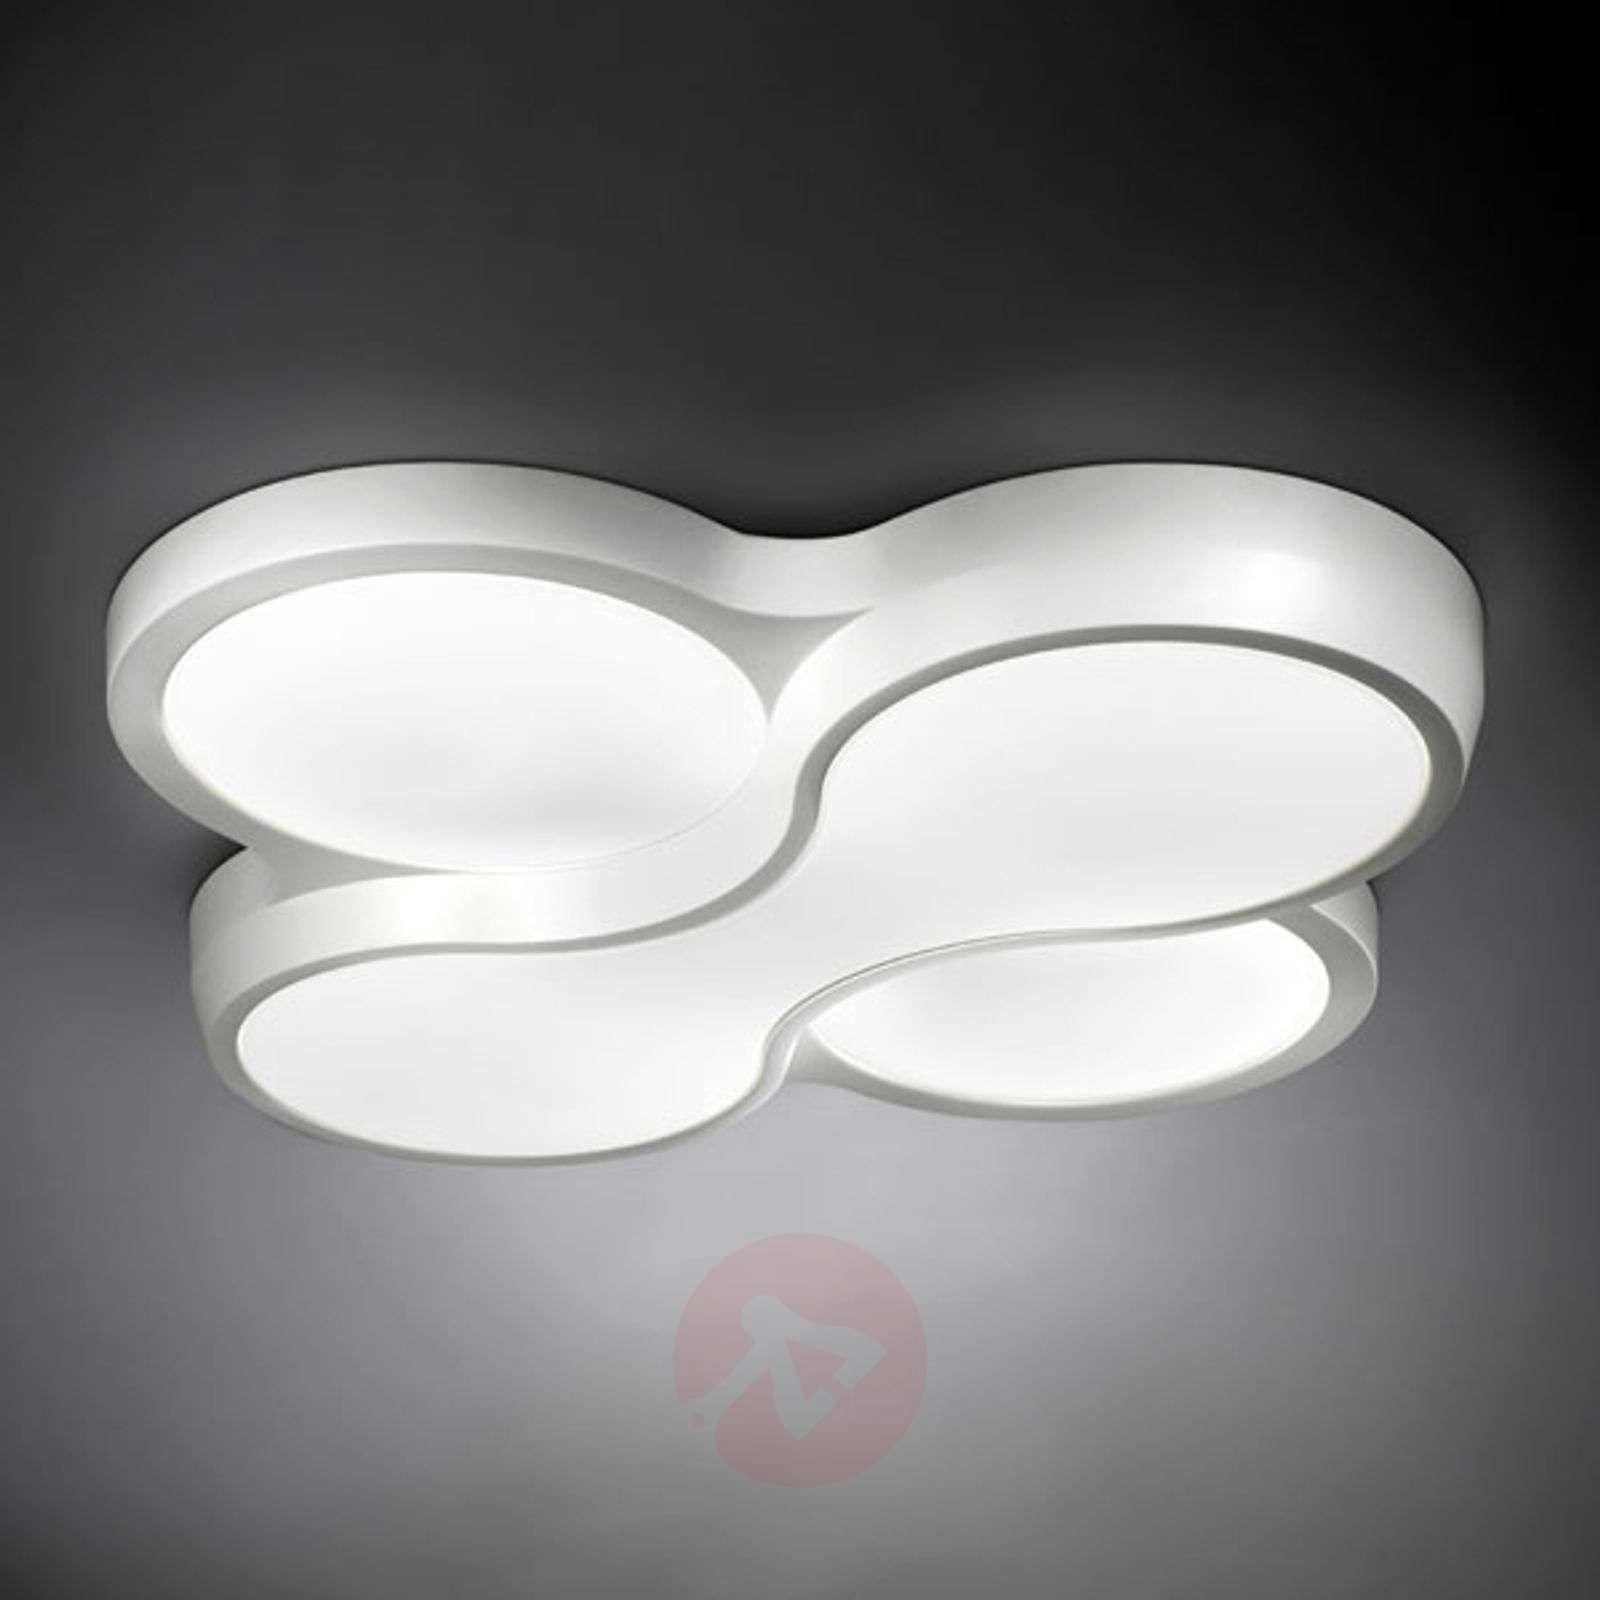 unusual ceiling lighting. Unusual Ceiling Light Ocho With Four Bulbs-6027143-01 Lighting E